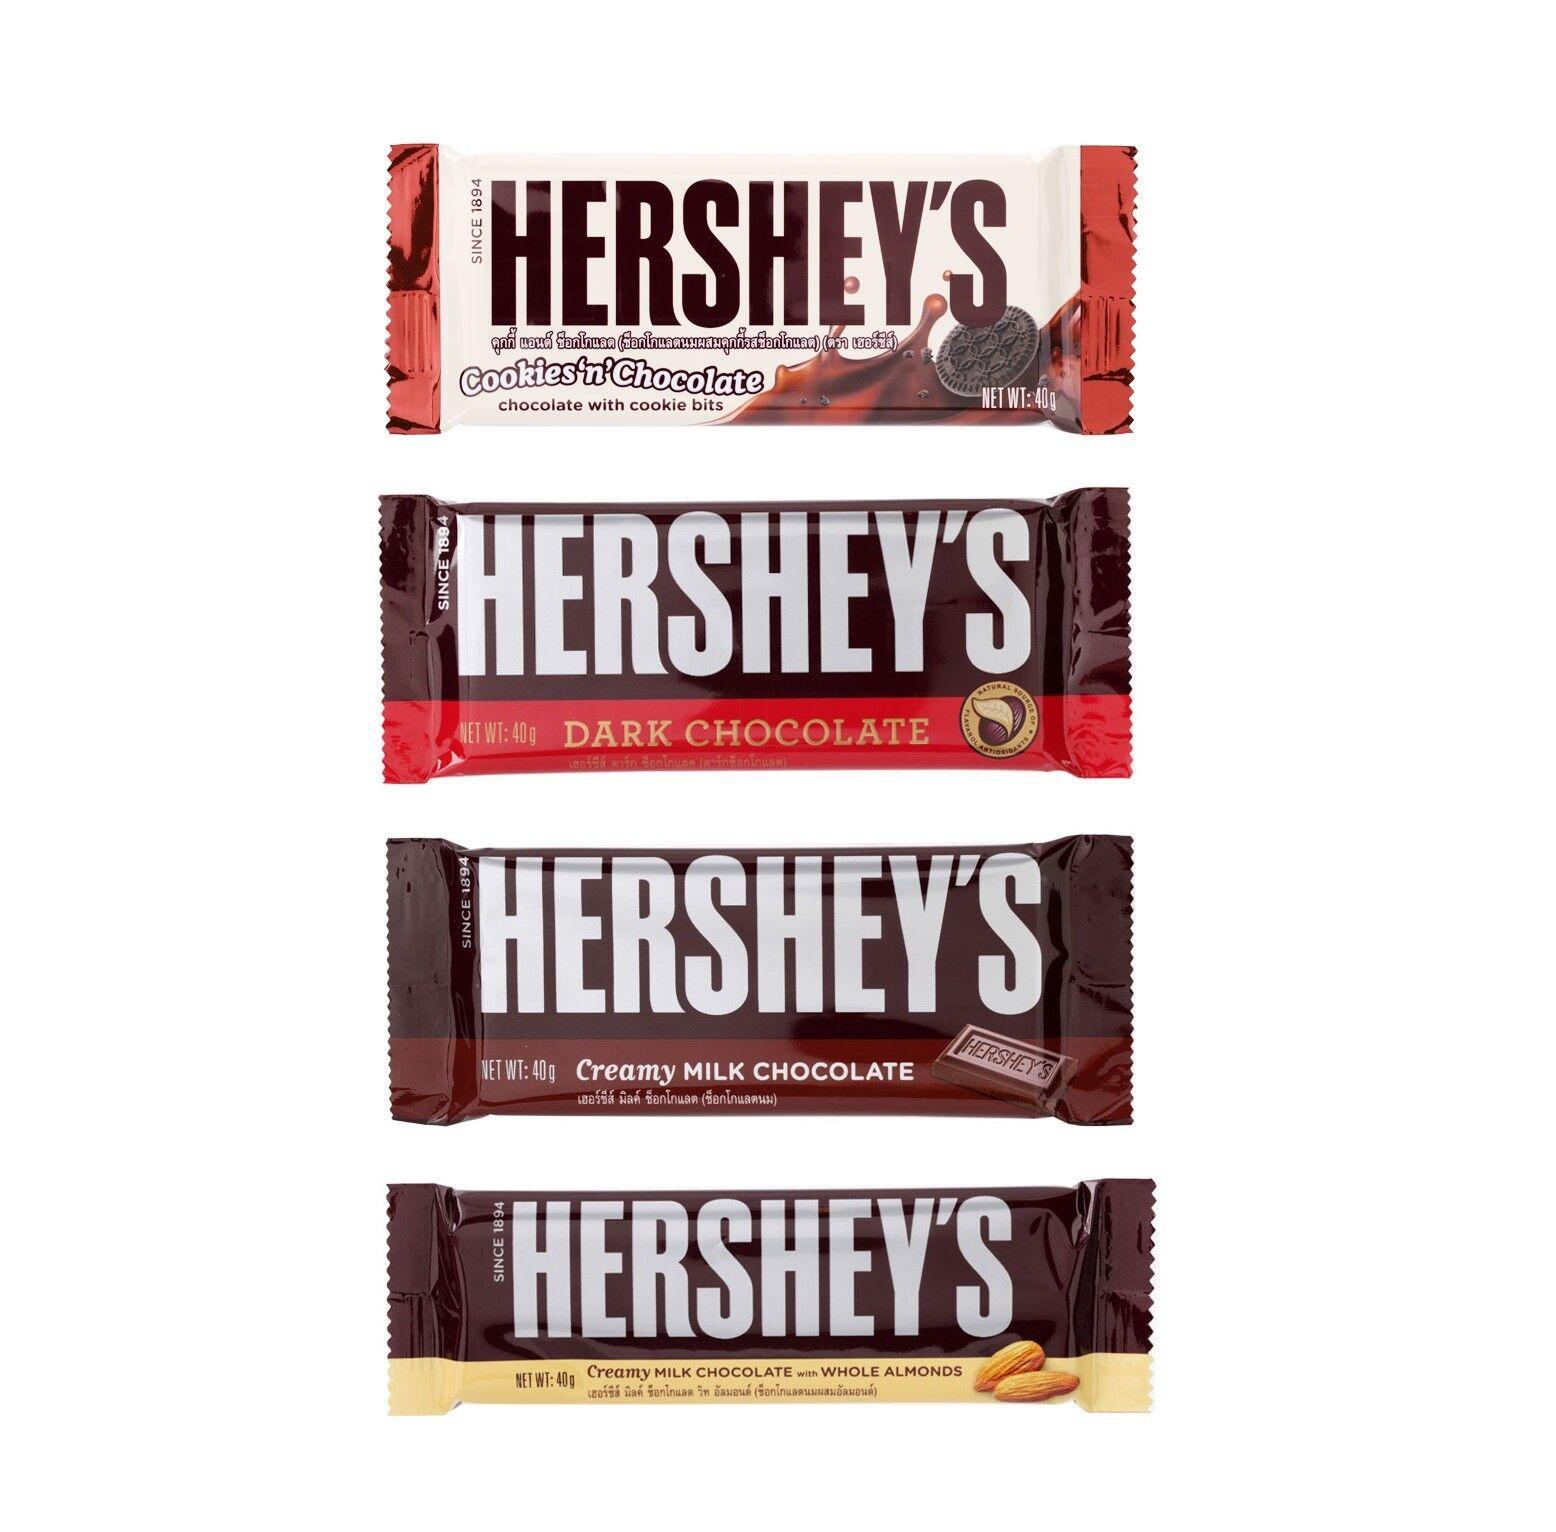 Hersheys Chocolate Bar Cookies Milk Almond Dark Chocolate